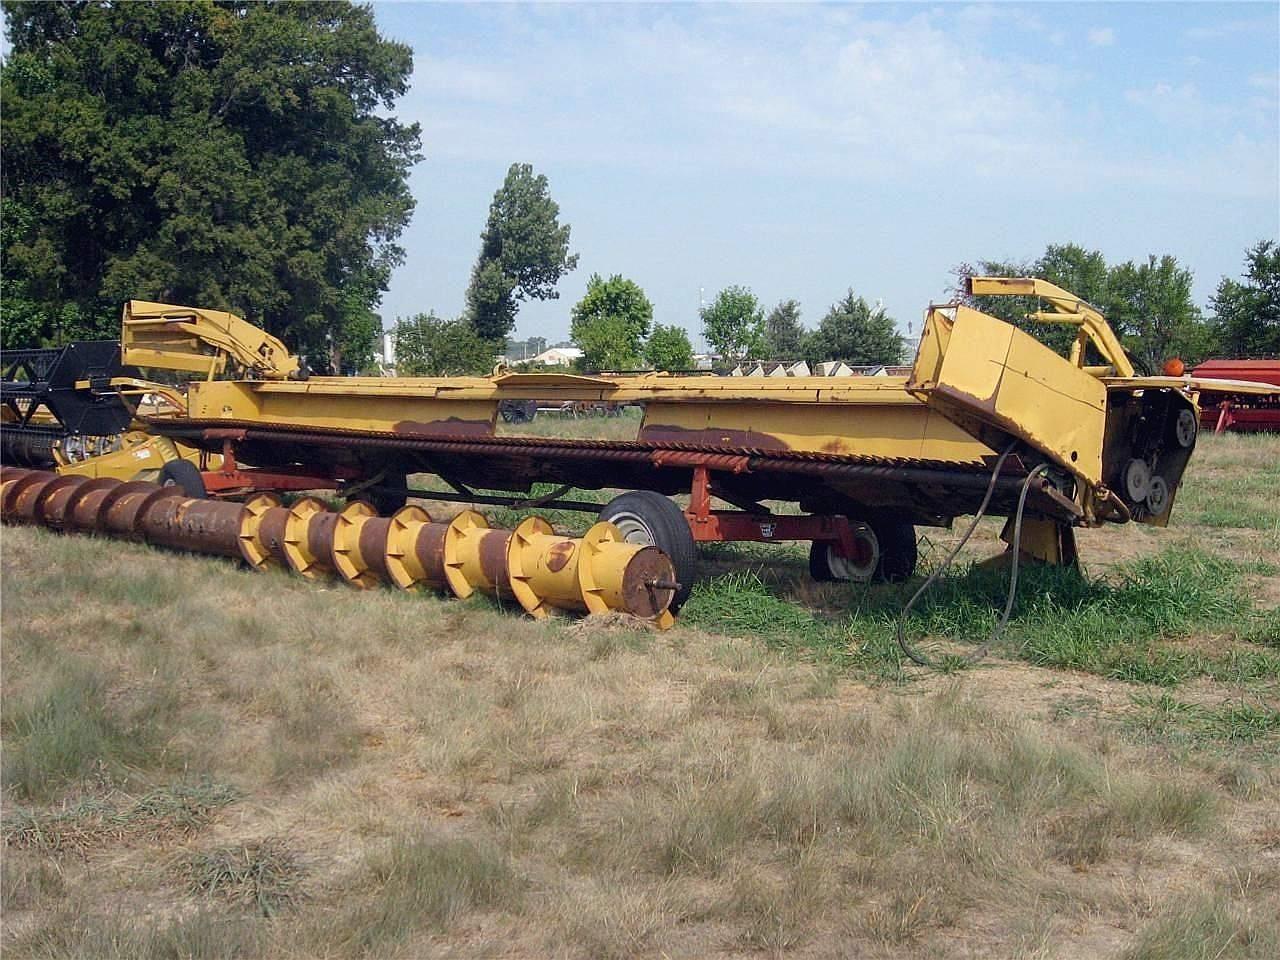 1999 Caterpillar F30 Platform